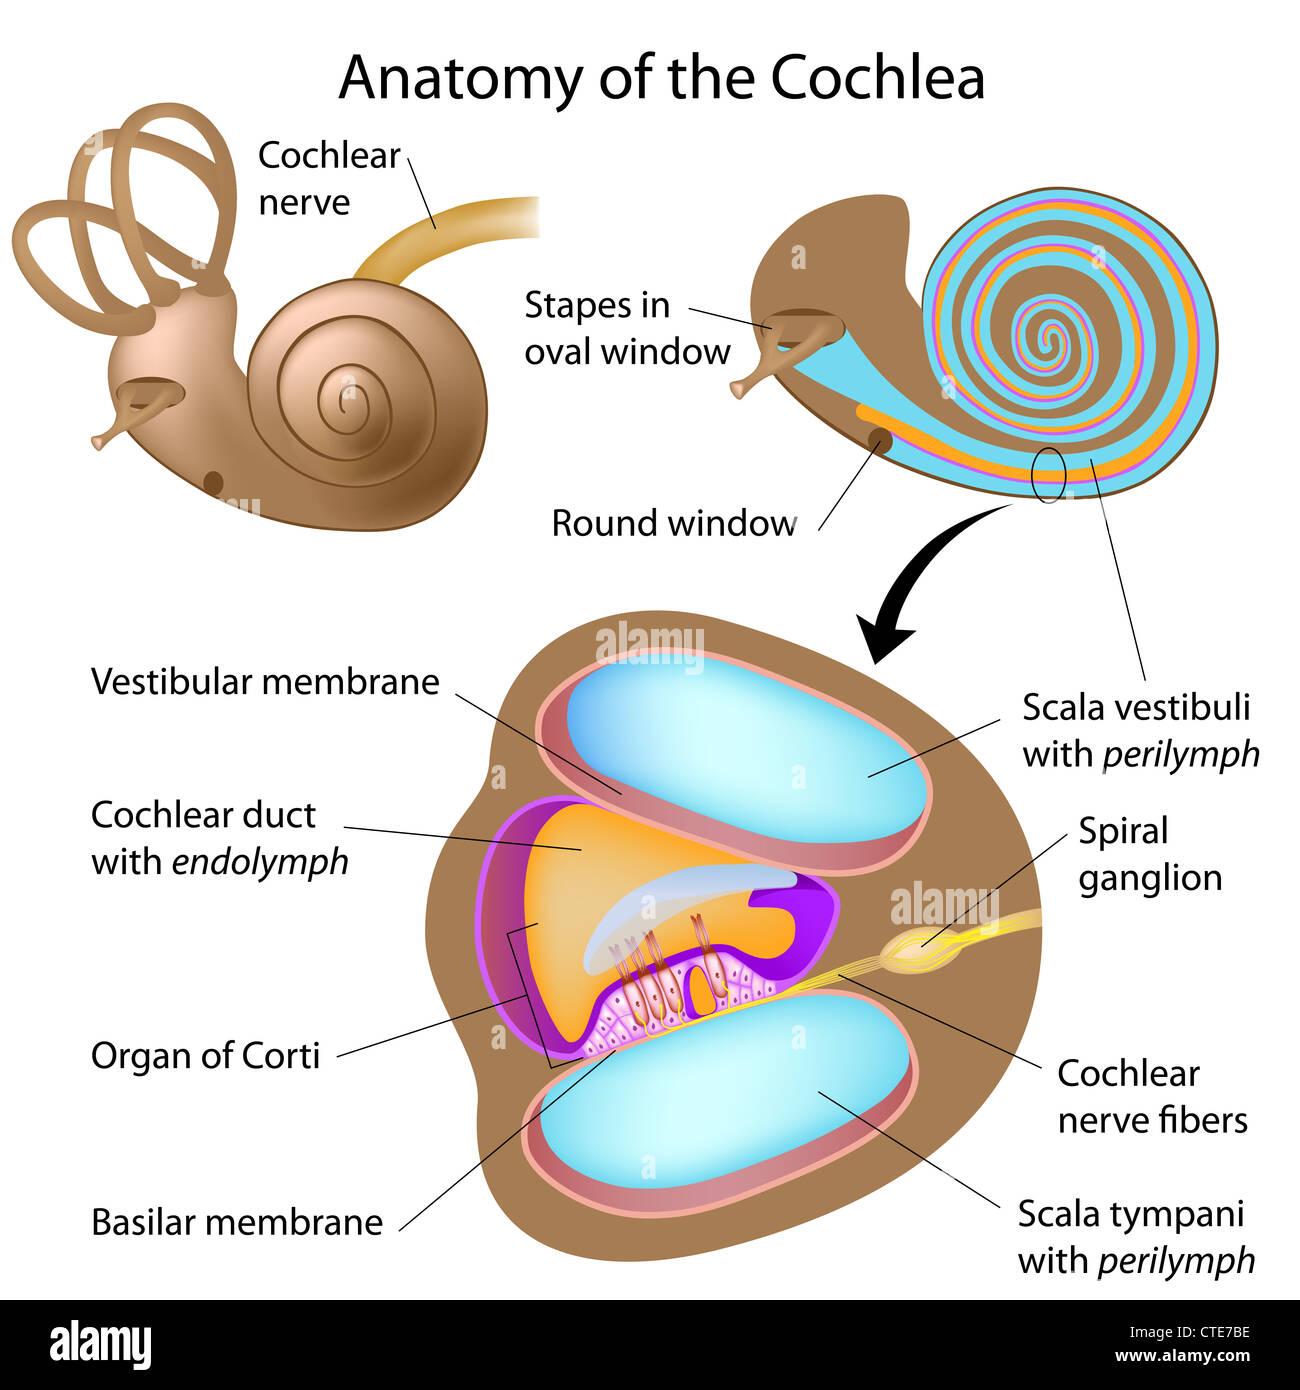 Anatomy Of The Cochlea Of Human Ear Stock Photo 49485618 Alamy